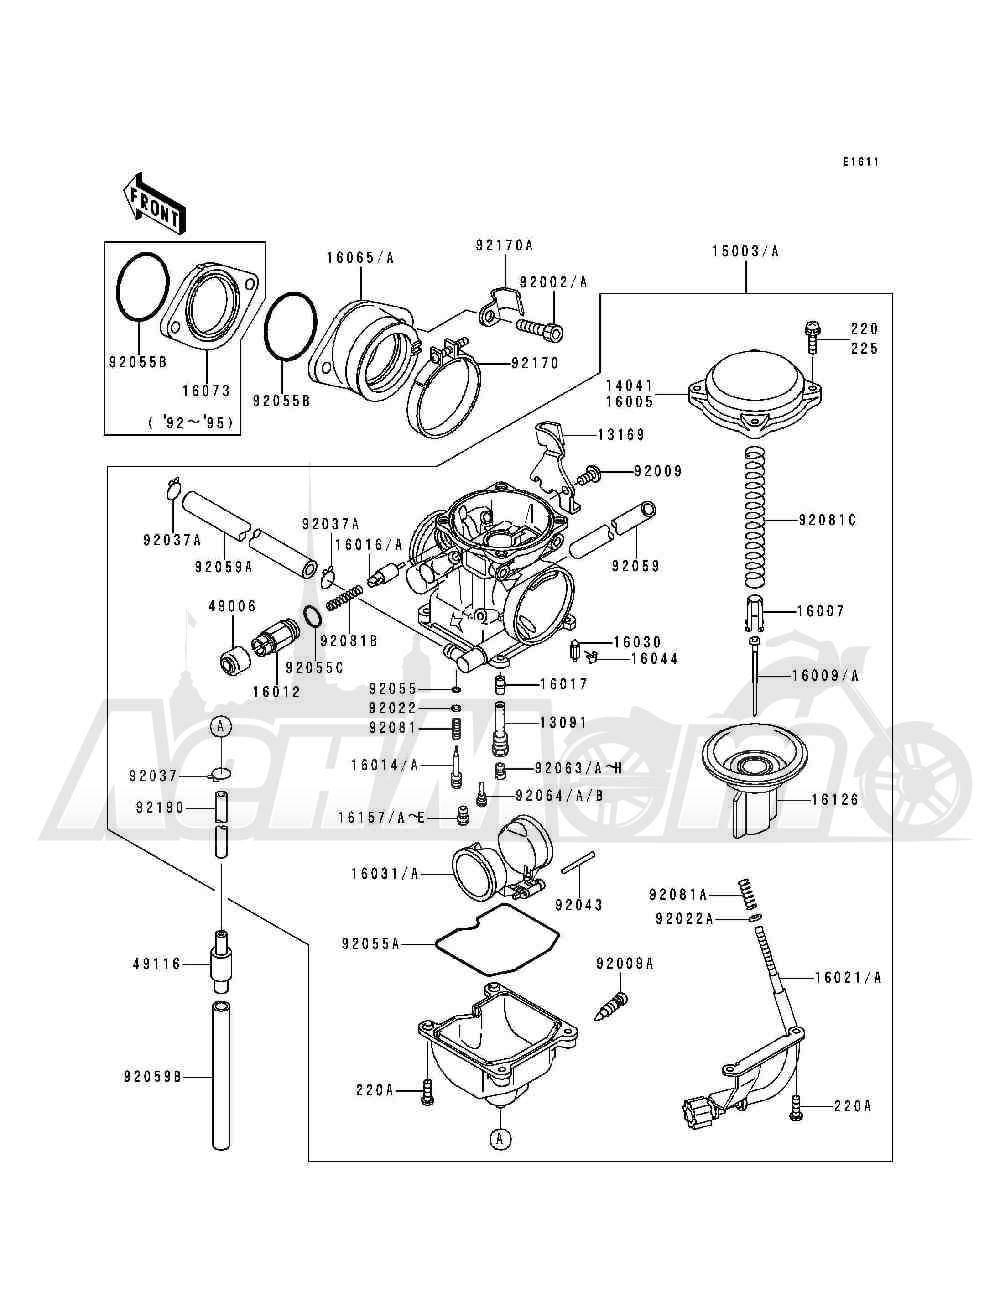 Запчасти для Квадроцикла Kawasaki 1993 BAYOU 300 (KLF300-B6) Раздел: CARBURETOR | карбюратор